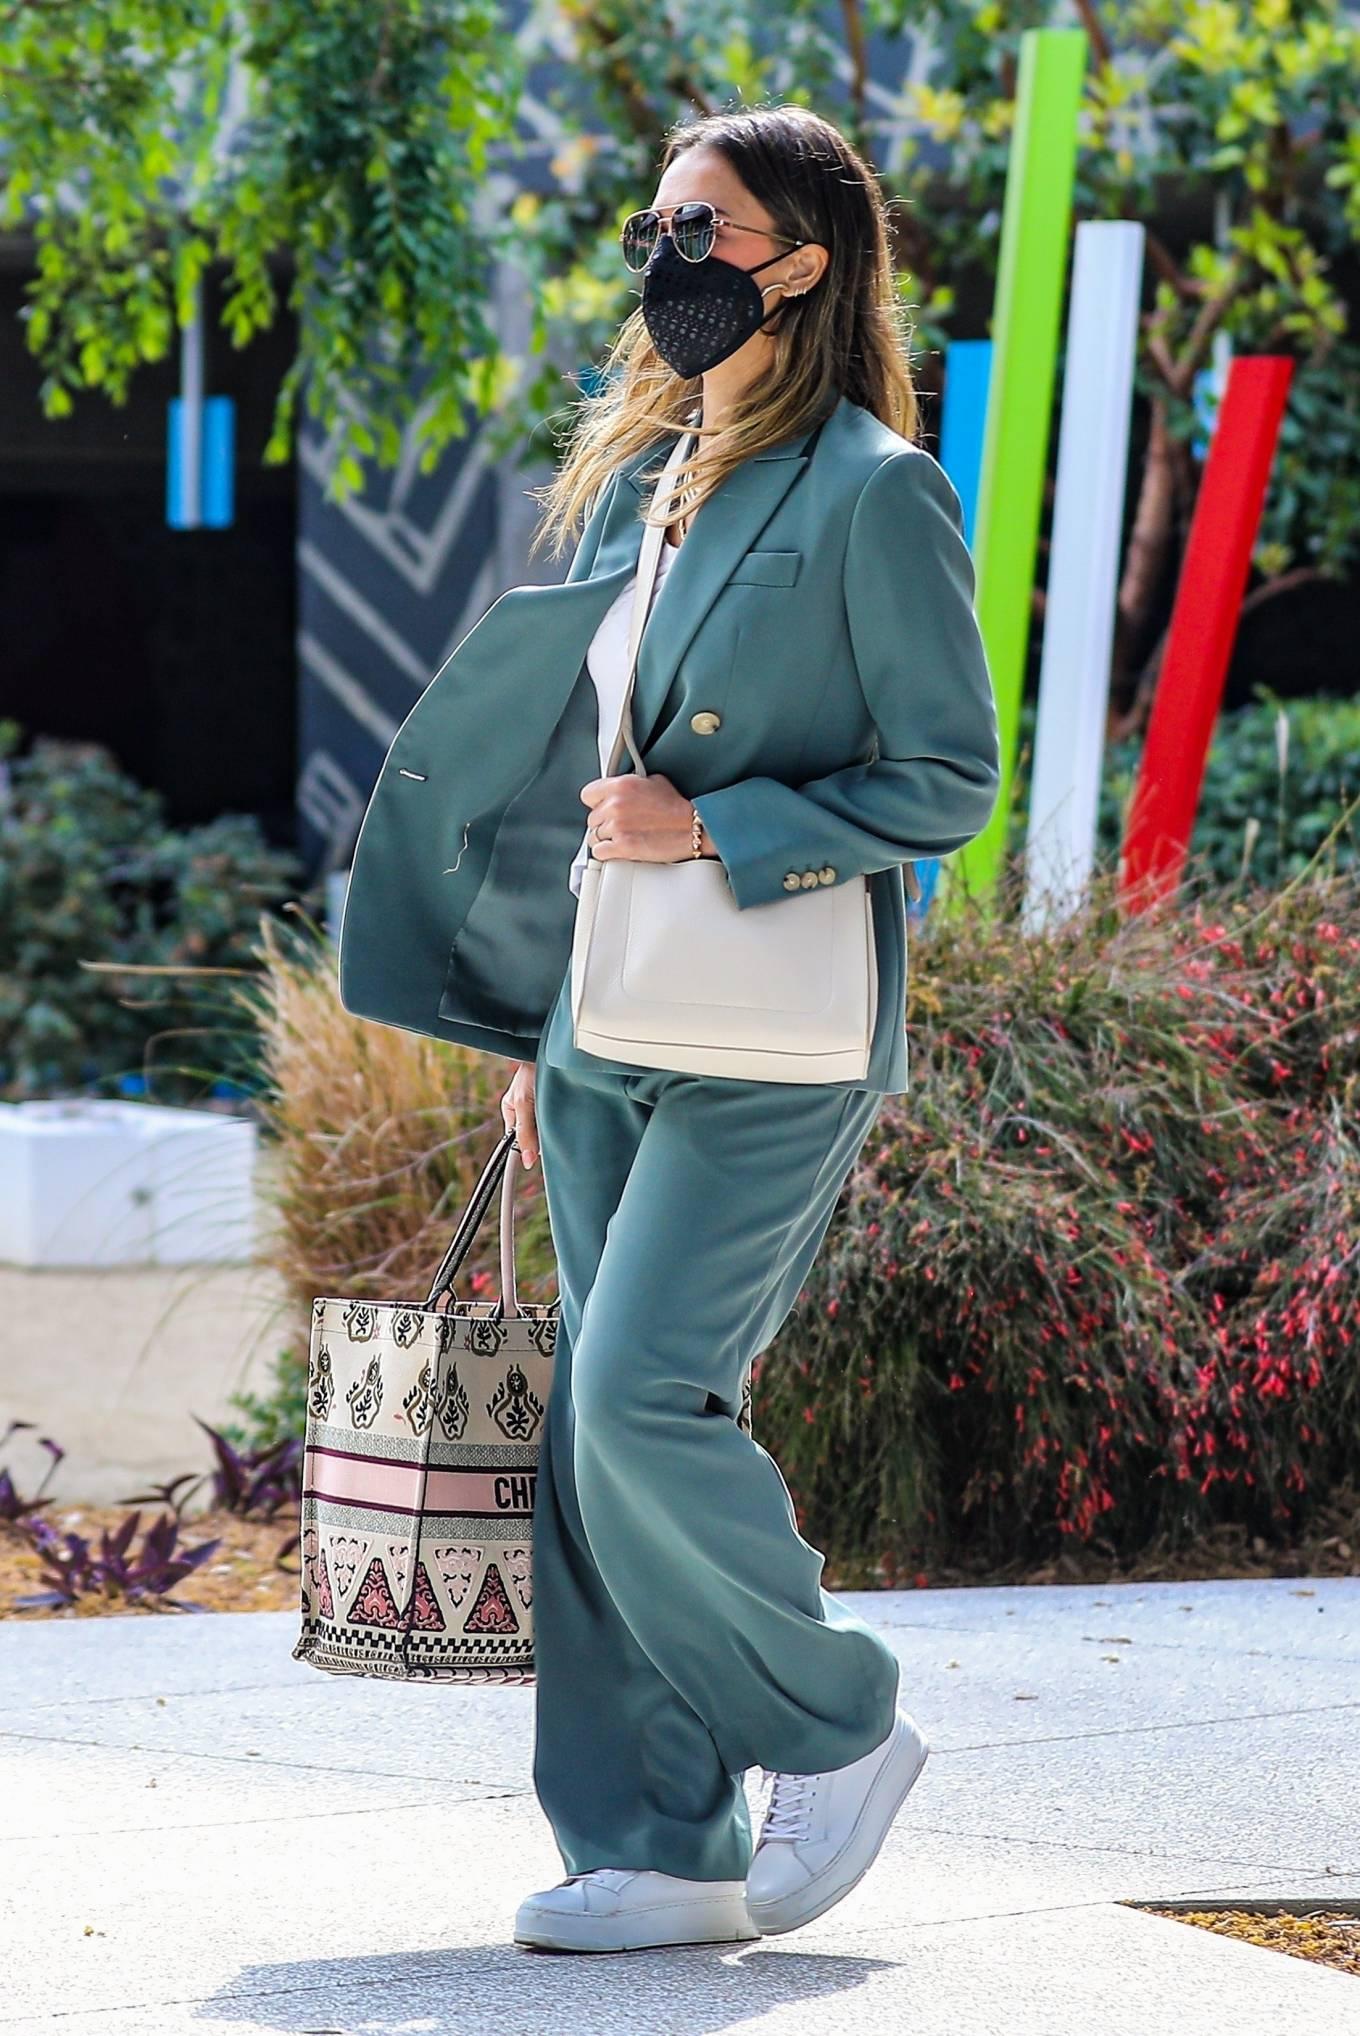 Jessica Alba 2021 : Jessica Alba – Out in a classy suit in Playa Vista-17